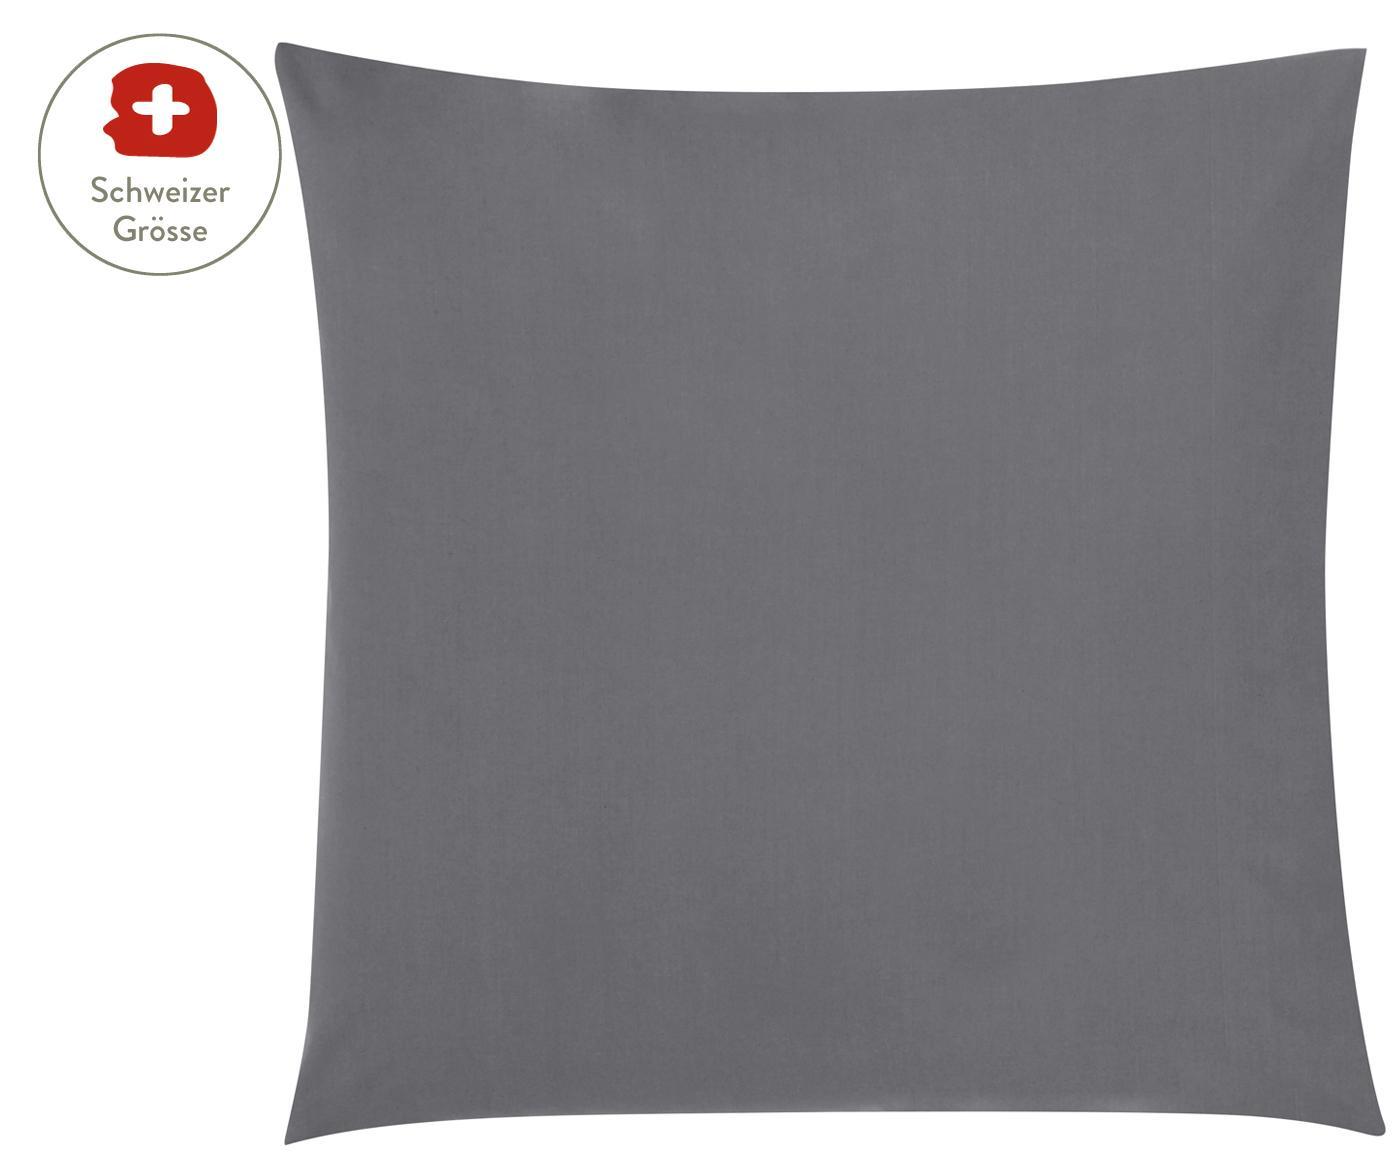 Baumwollperkal-Kissenbezug Elsie in Dunkelgrau, Webart: Perkal Fadendichte 200 TC, Dunkelgrau, 65 x 65 cm